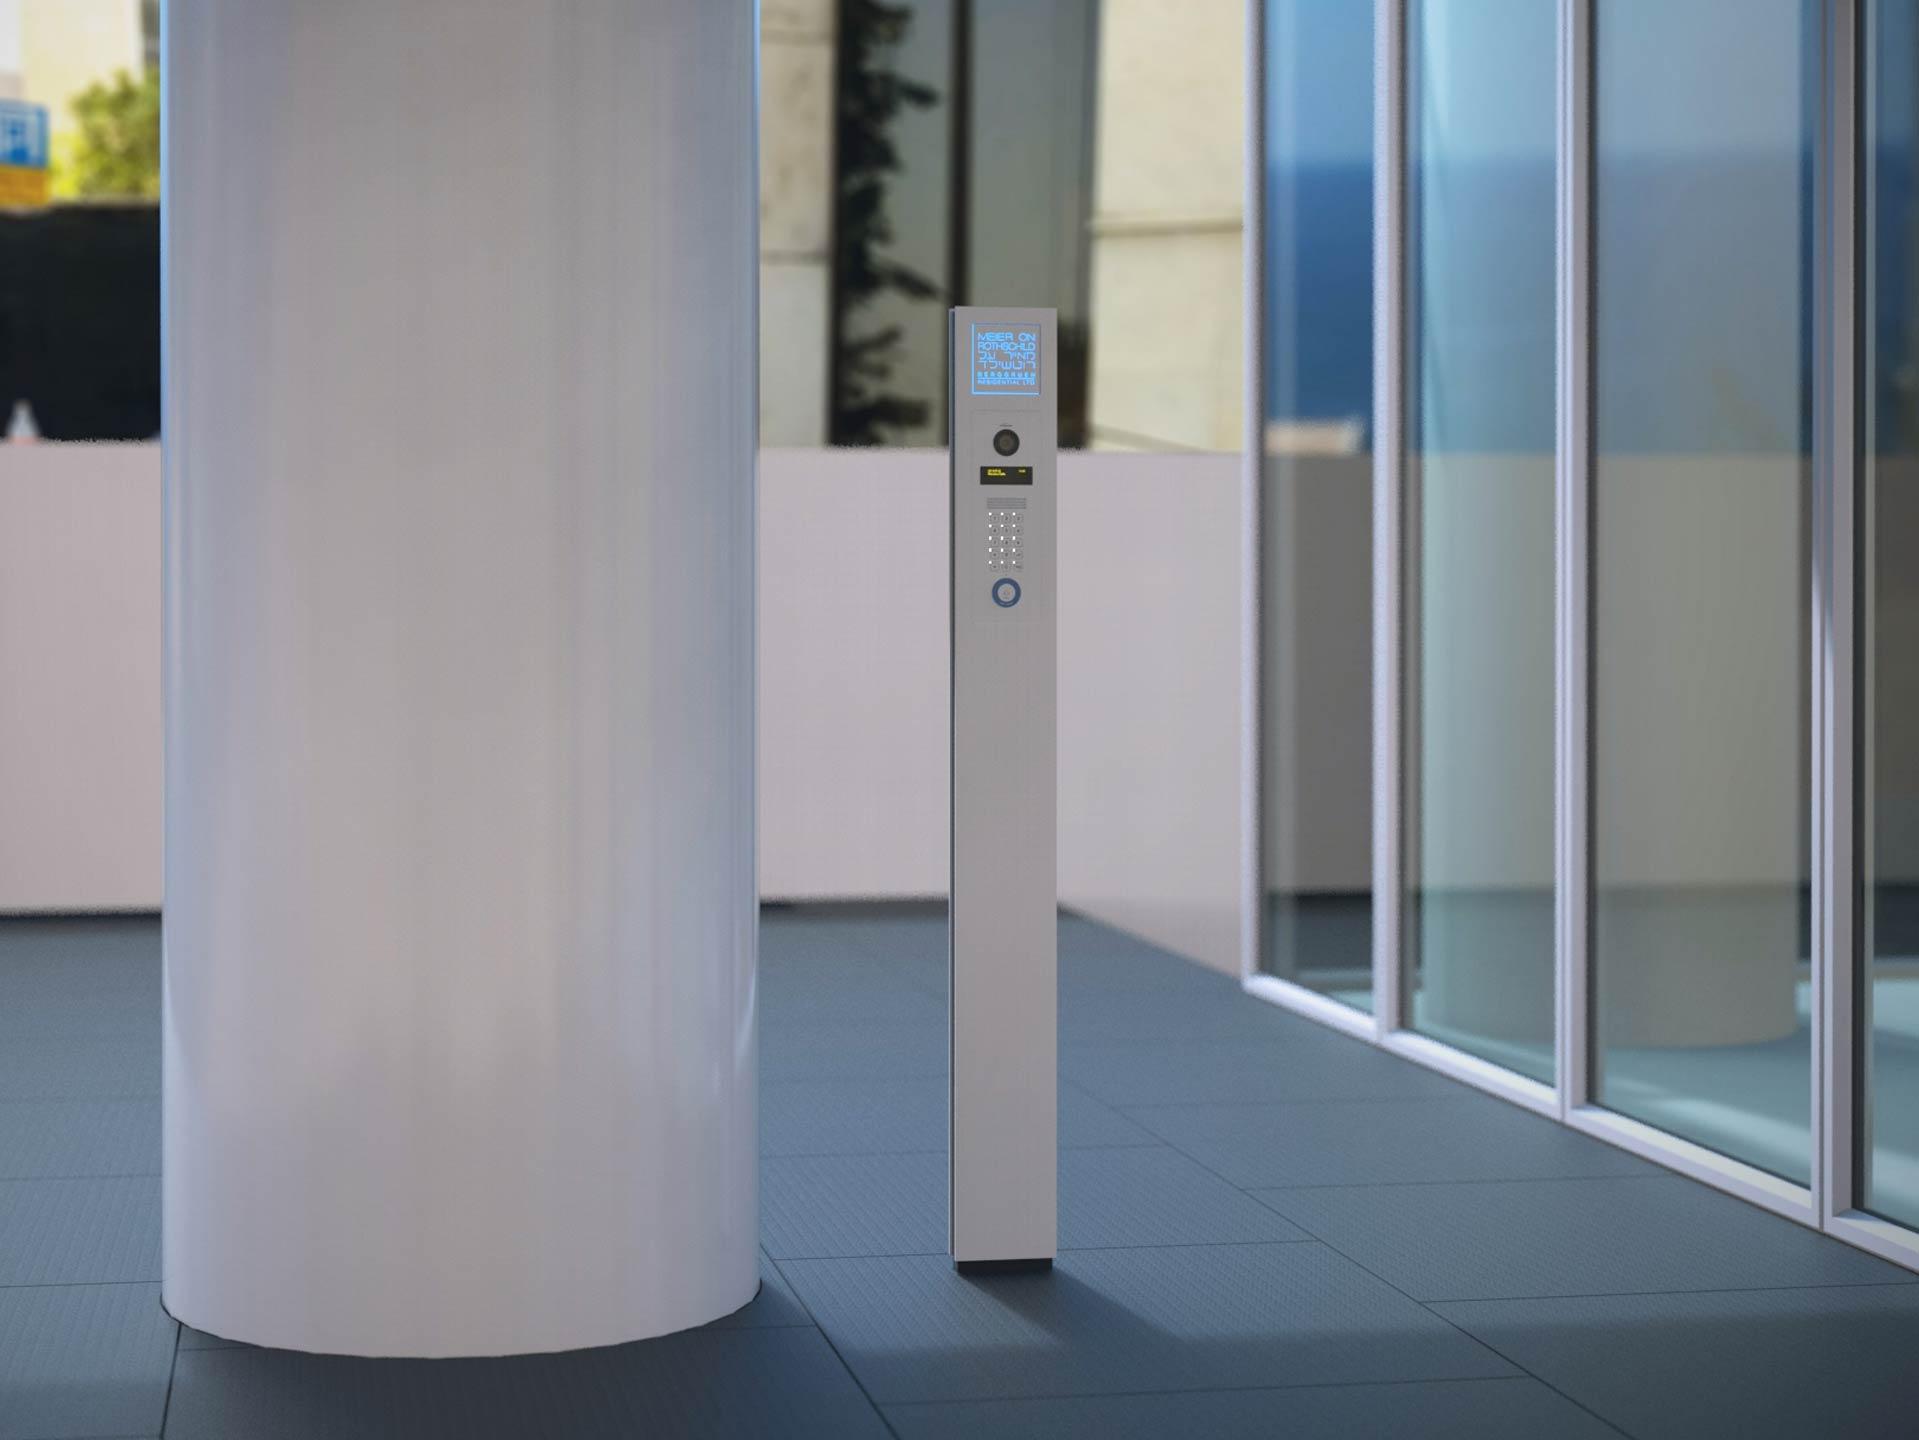 3D rendering of the intercom post.